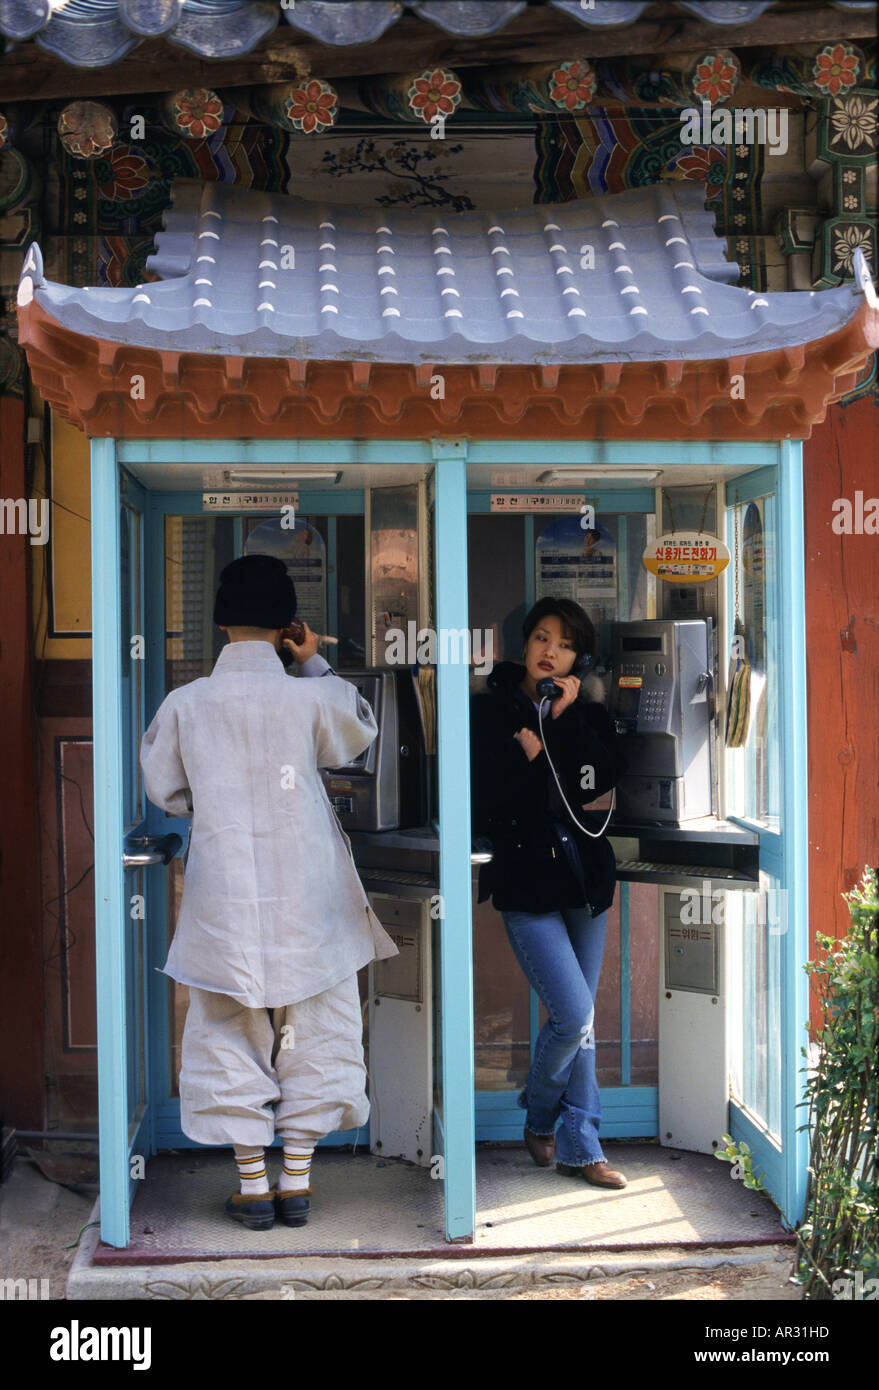 Monk and woman, telephone booth in Haein-sa monast, Haein-sa, Kayasan National Park South Korea, Asia - Stock Image